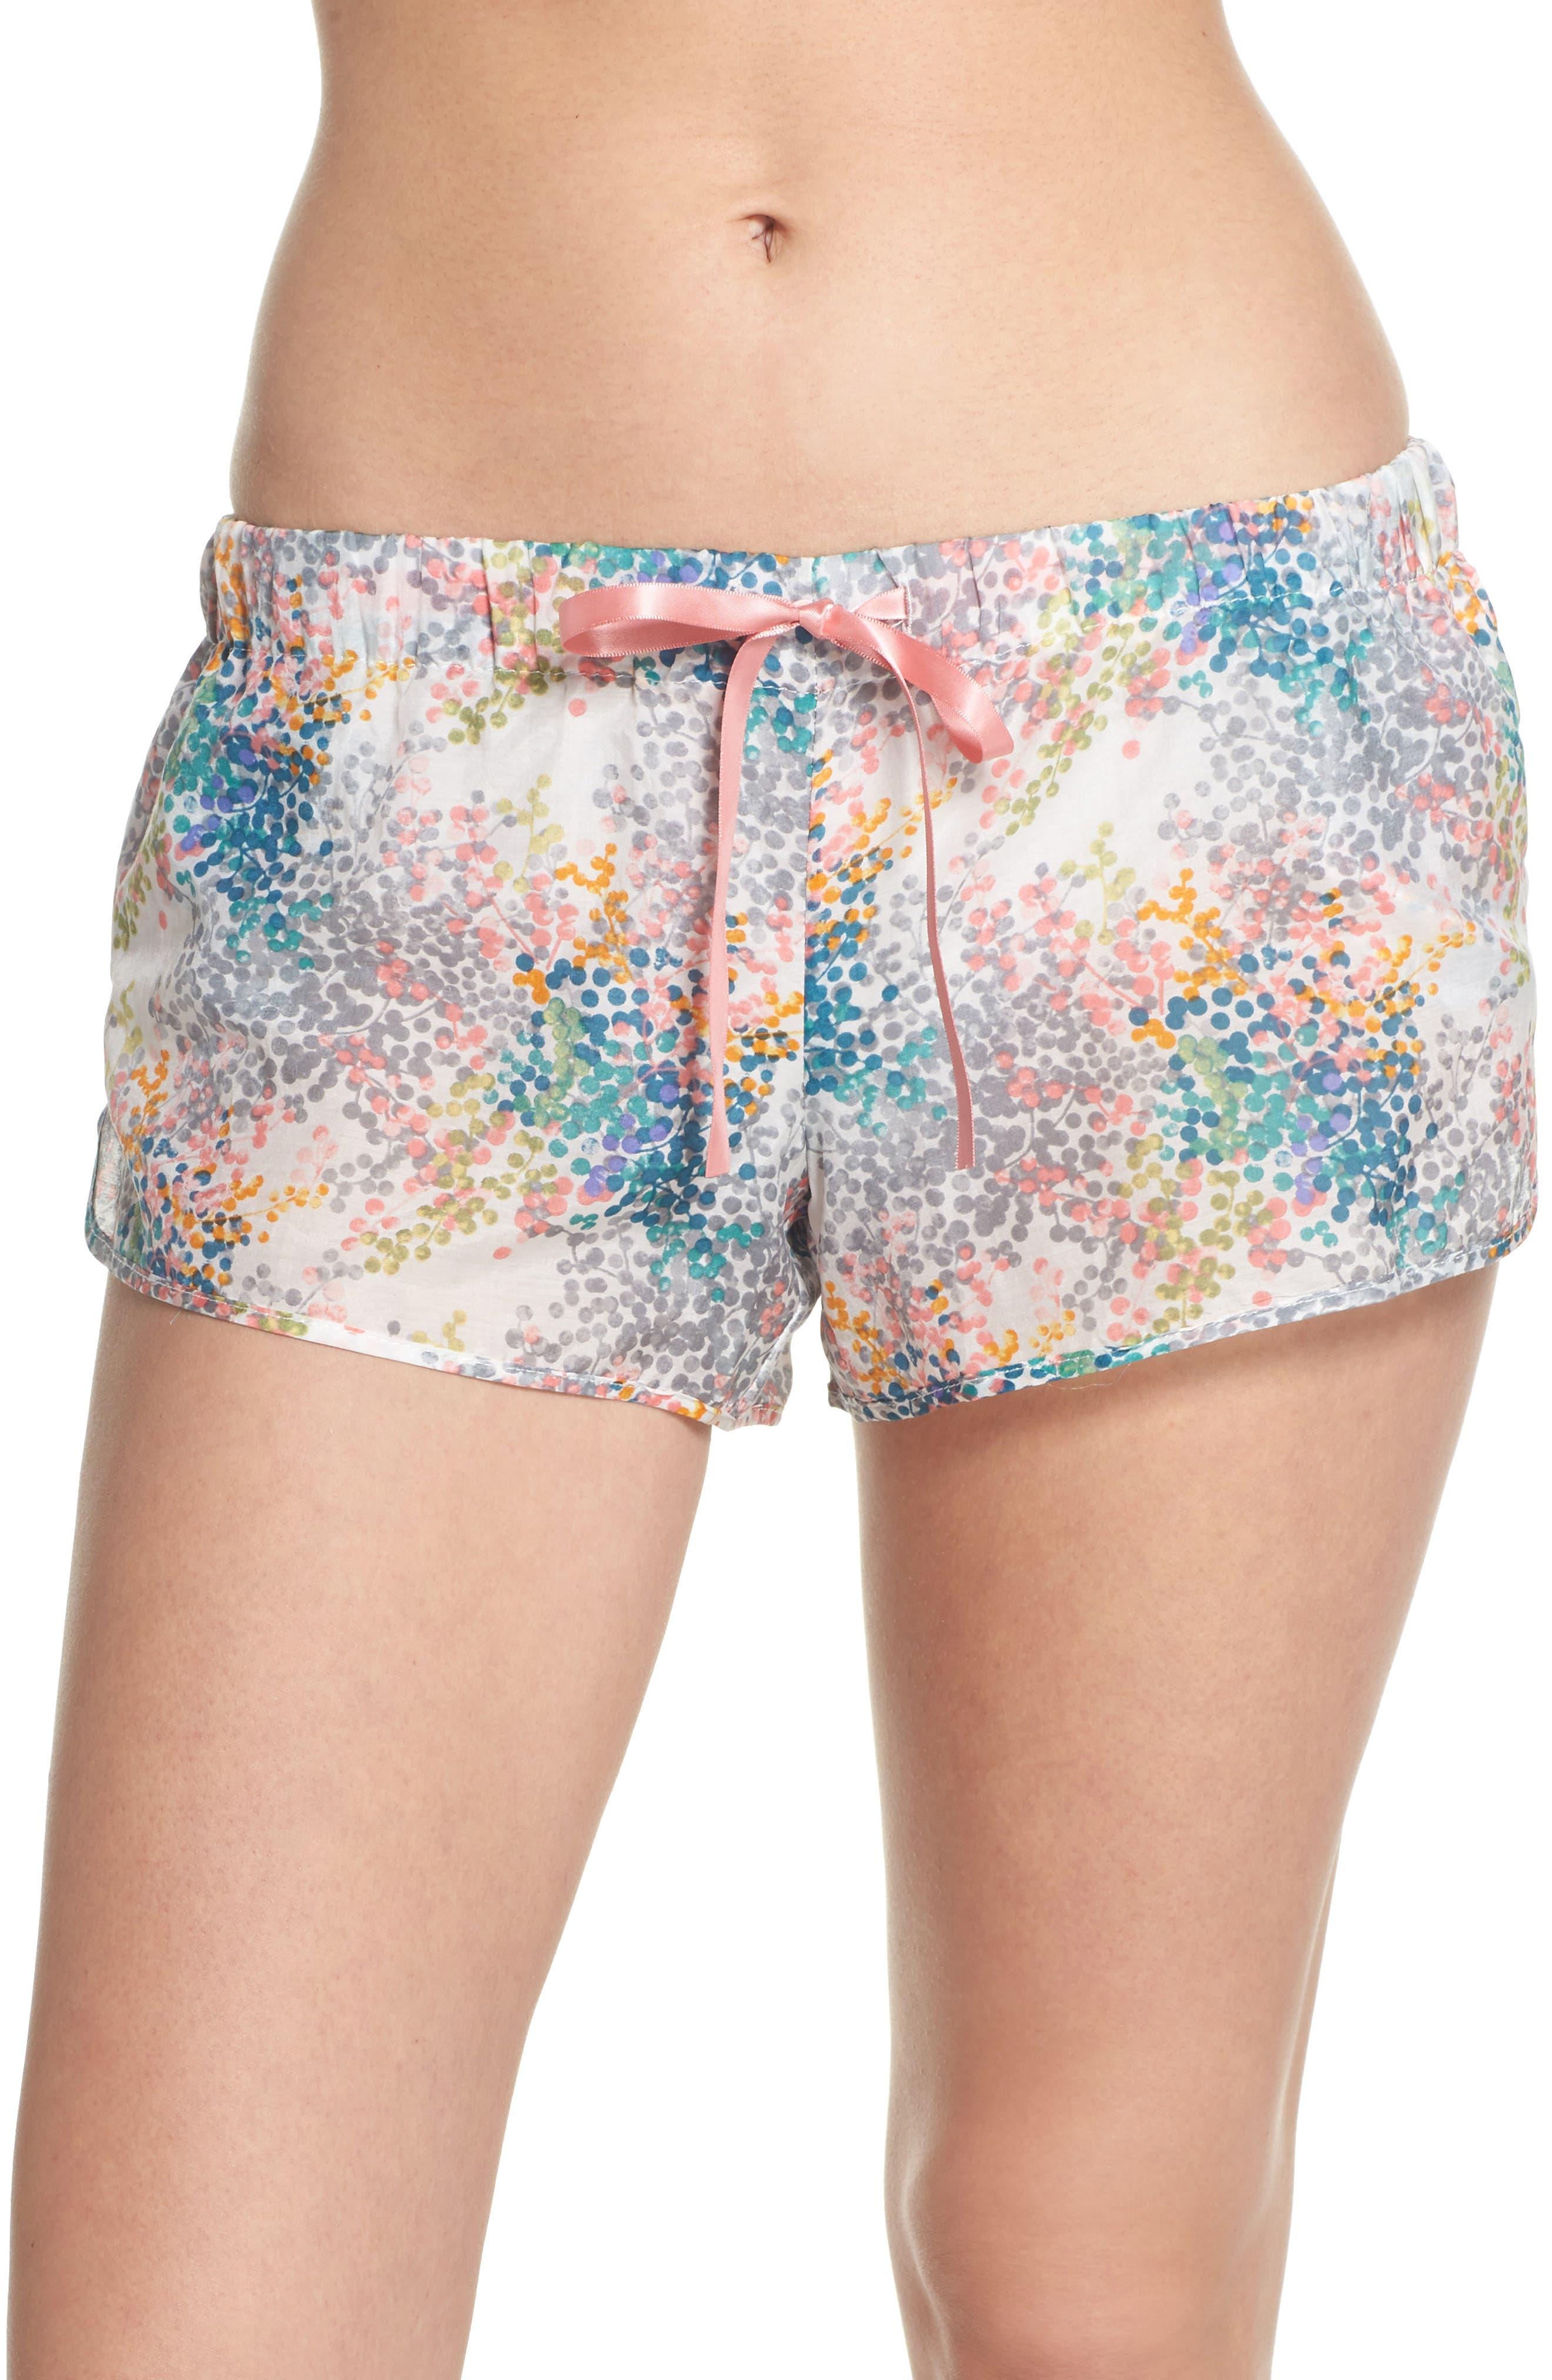 Bouquet Pajama Shorts,                             Main thumbnail 1, color,                             442